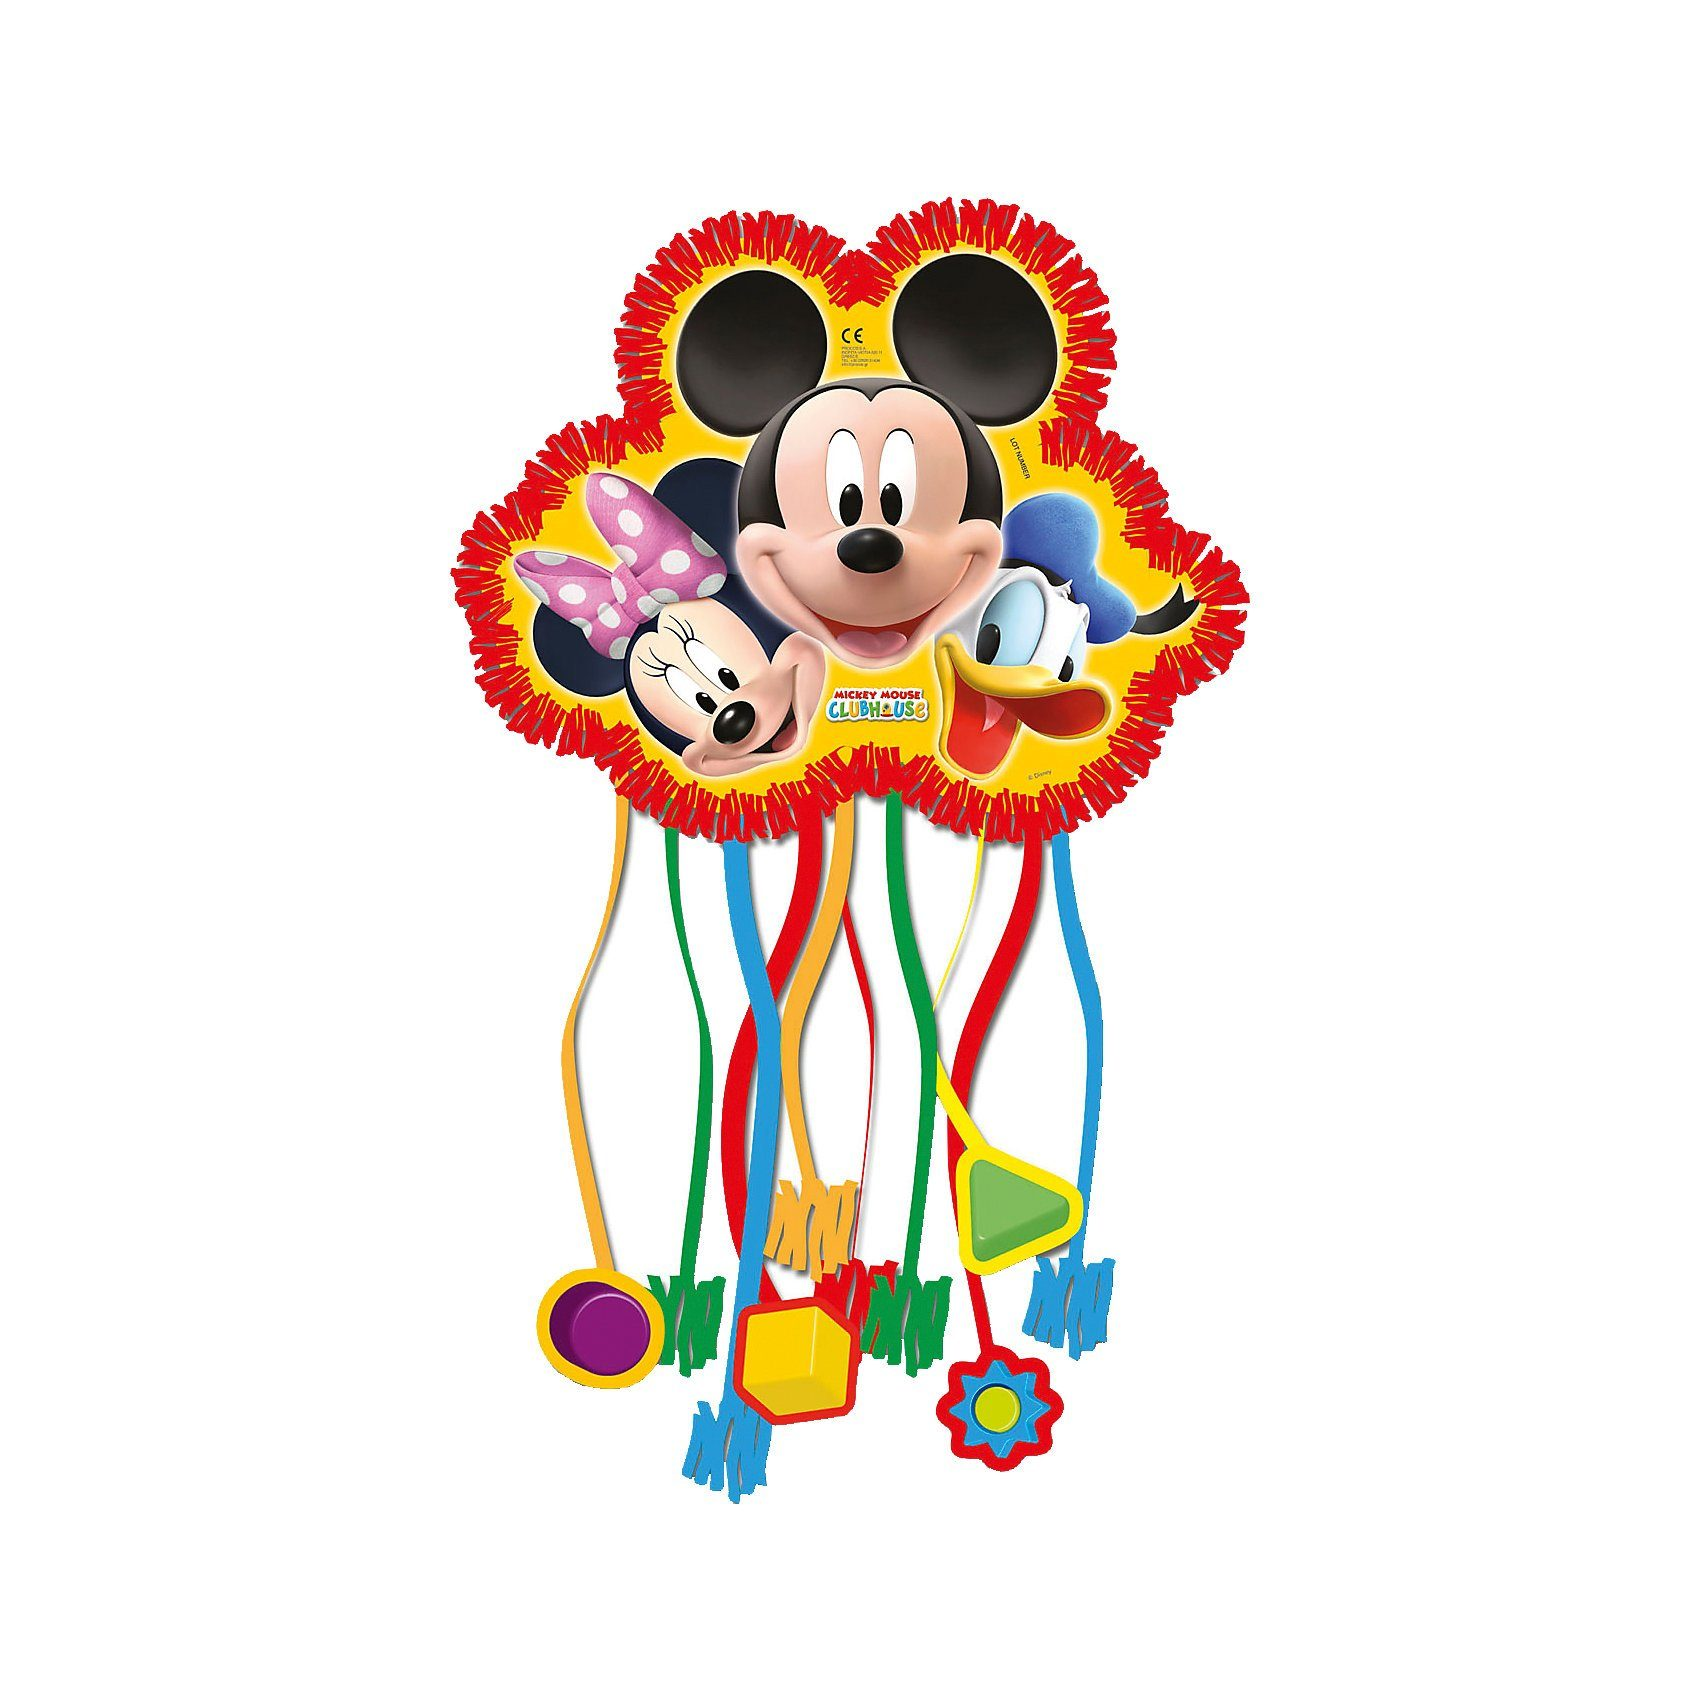 Procos Pull-Pinata Mickey Mouse & Friends